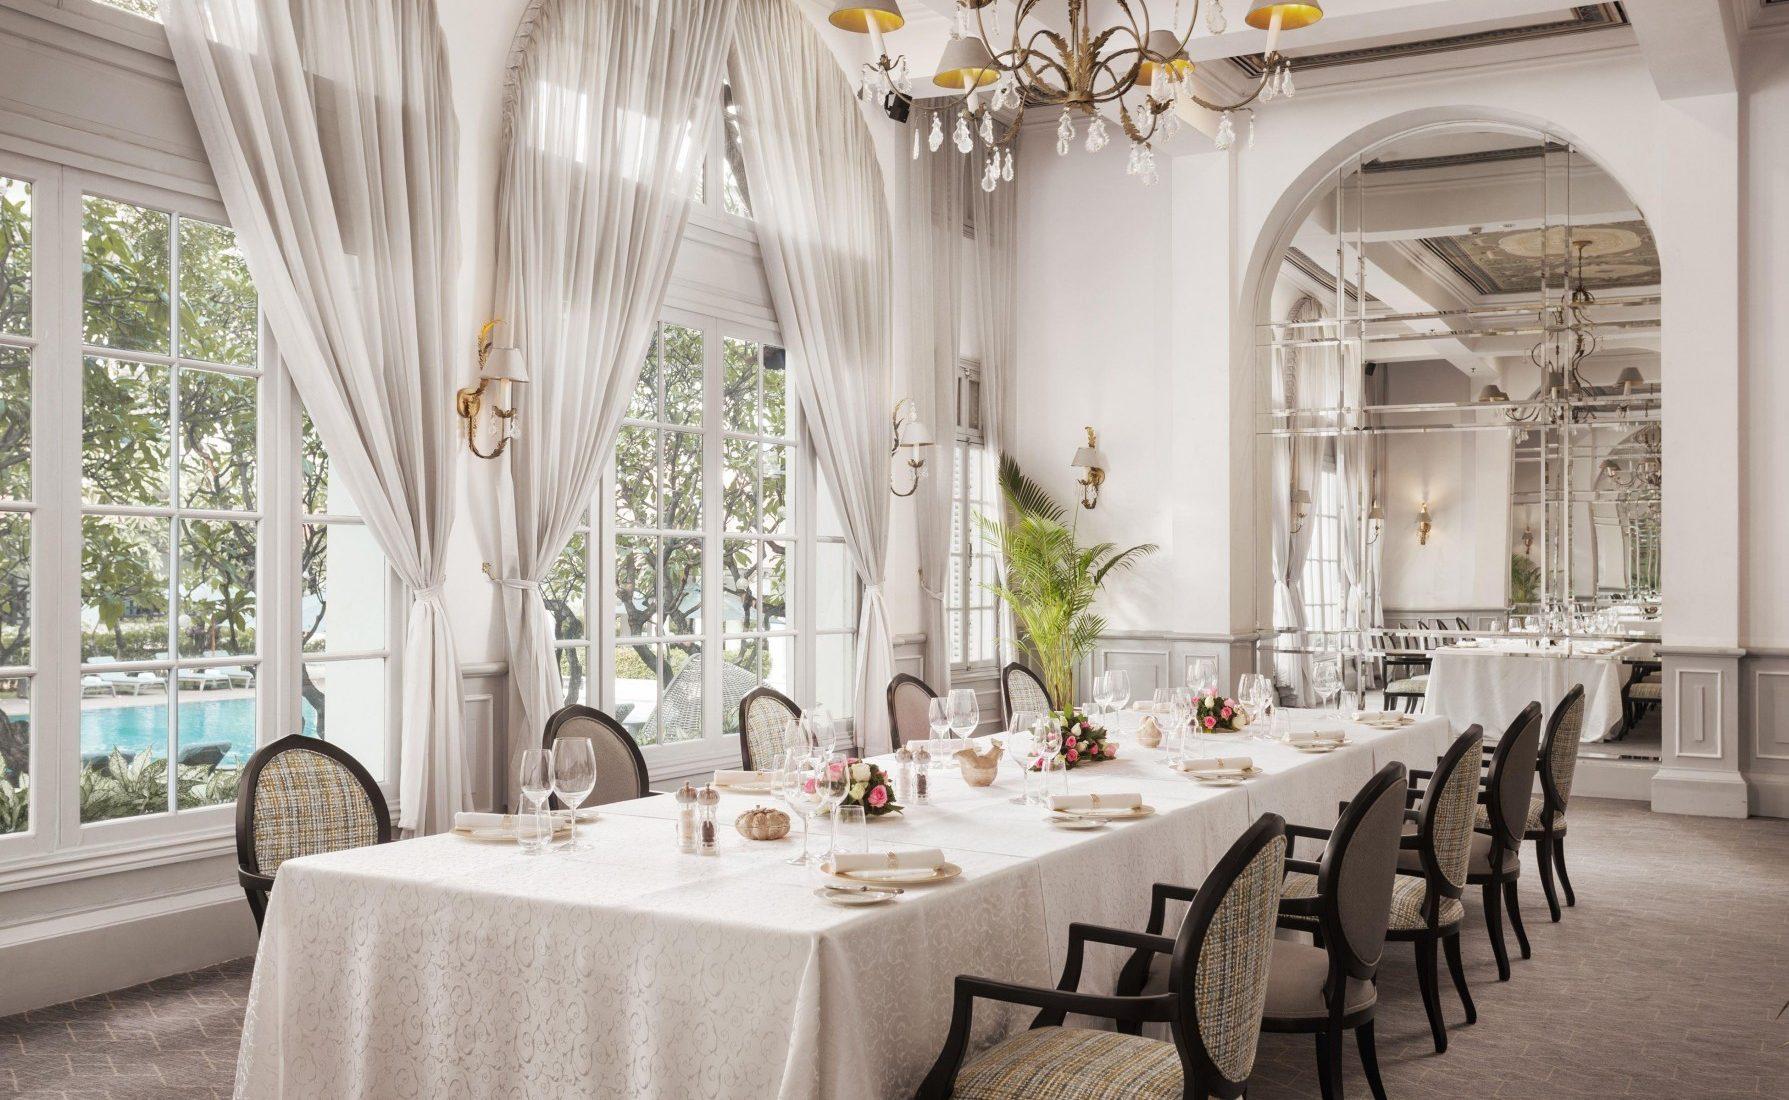 Raffles Hotel Le Royal Phnom Penh - Restaurant Le Royal